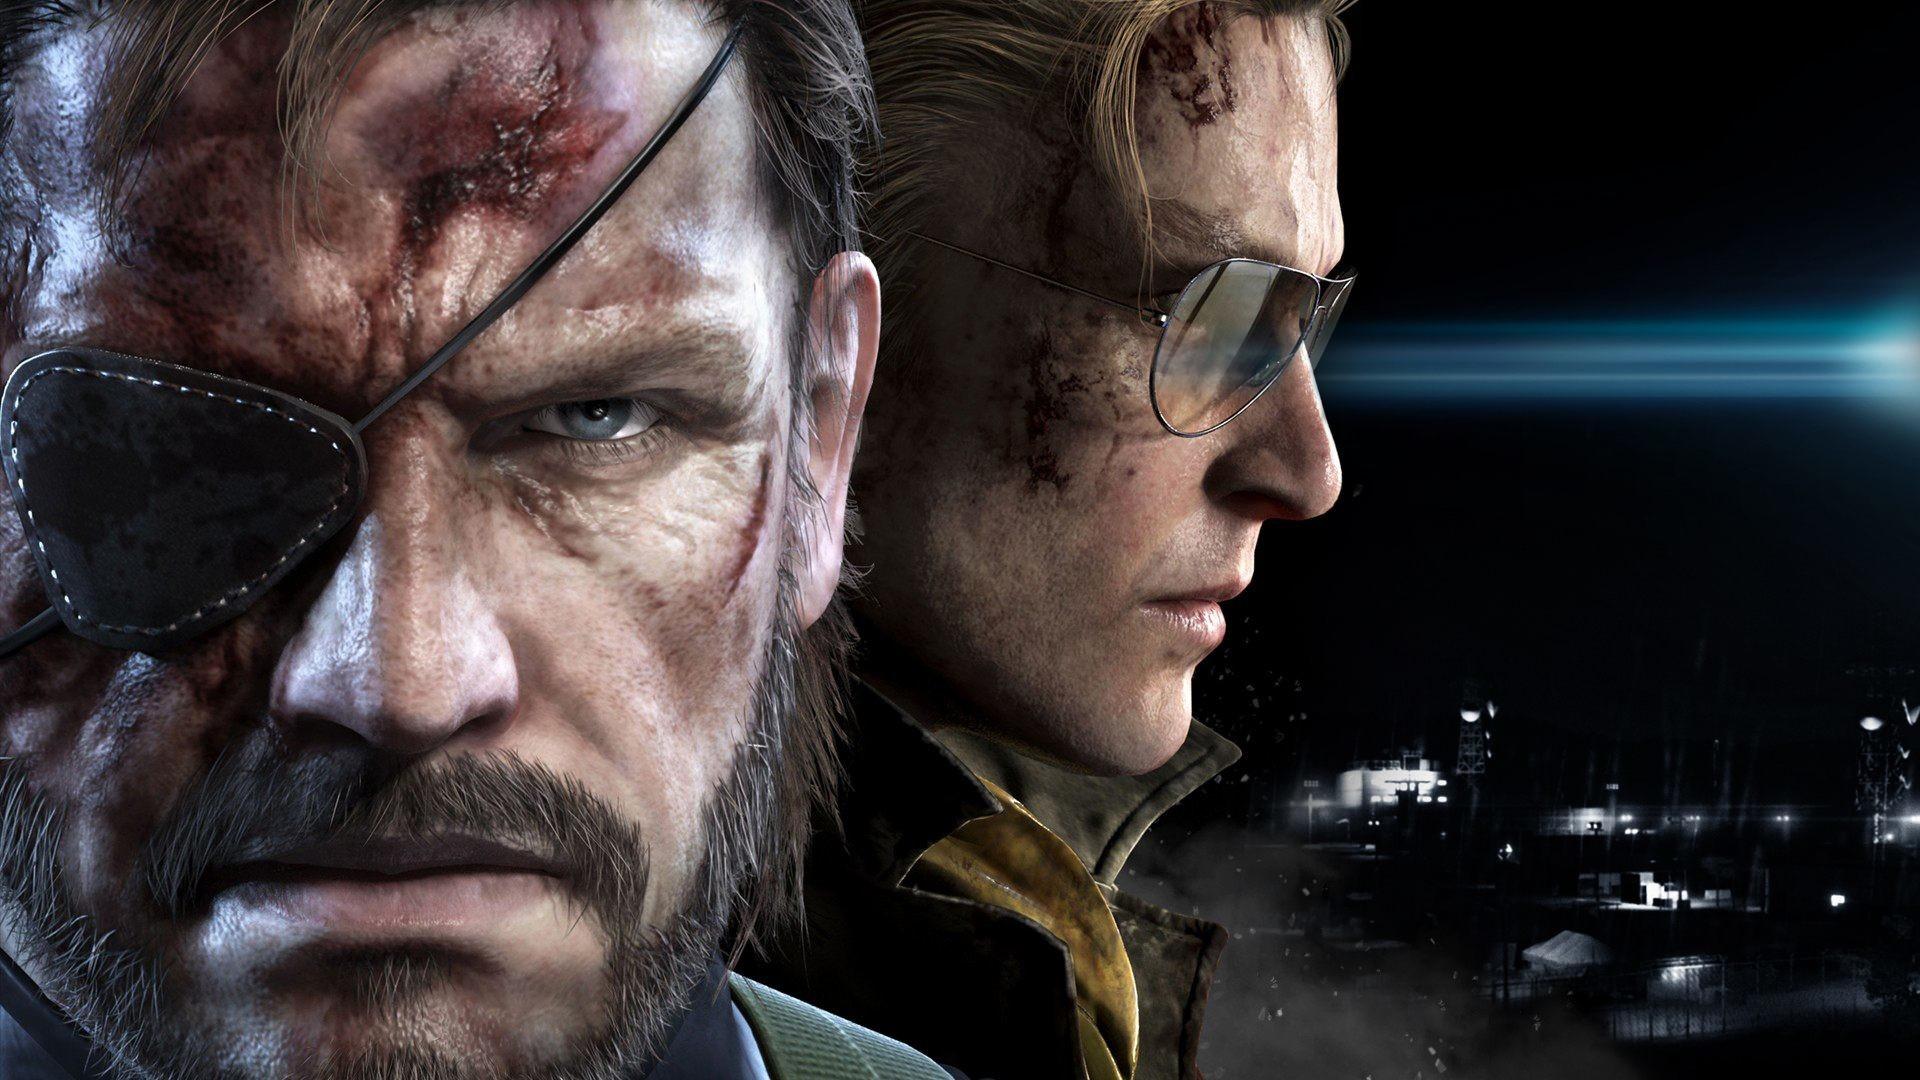 74 Metal Gear Solid 5